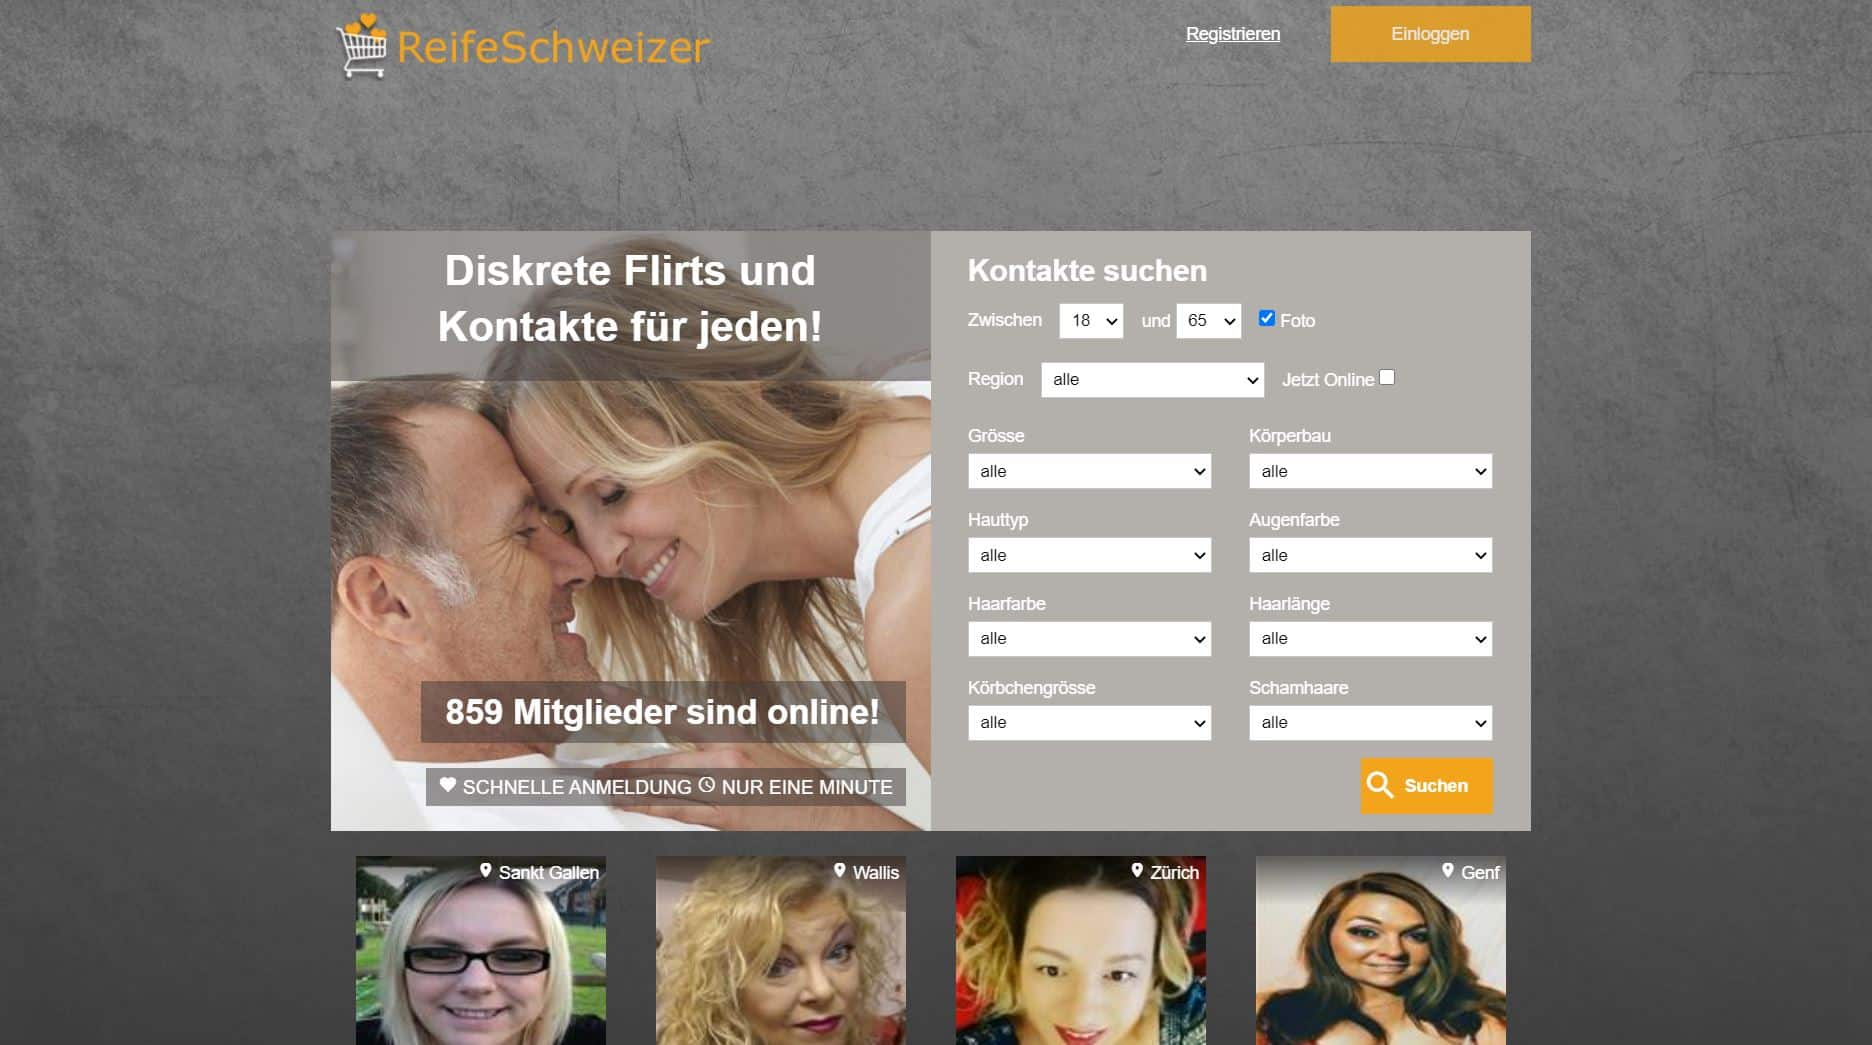 Testbericht - reifeschweizer.com Abzocke